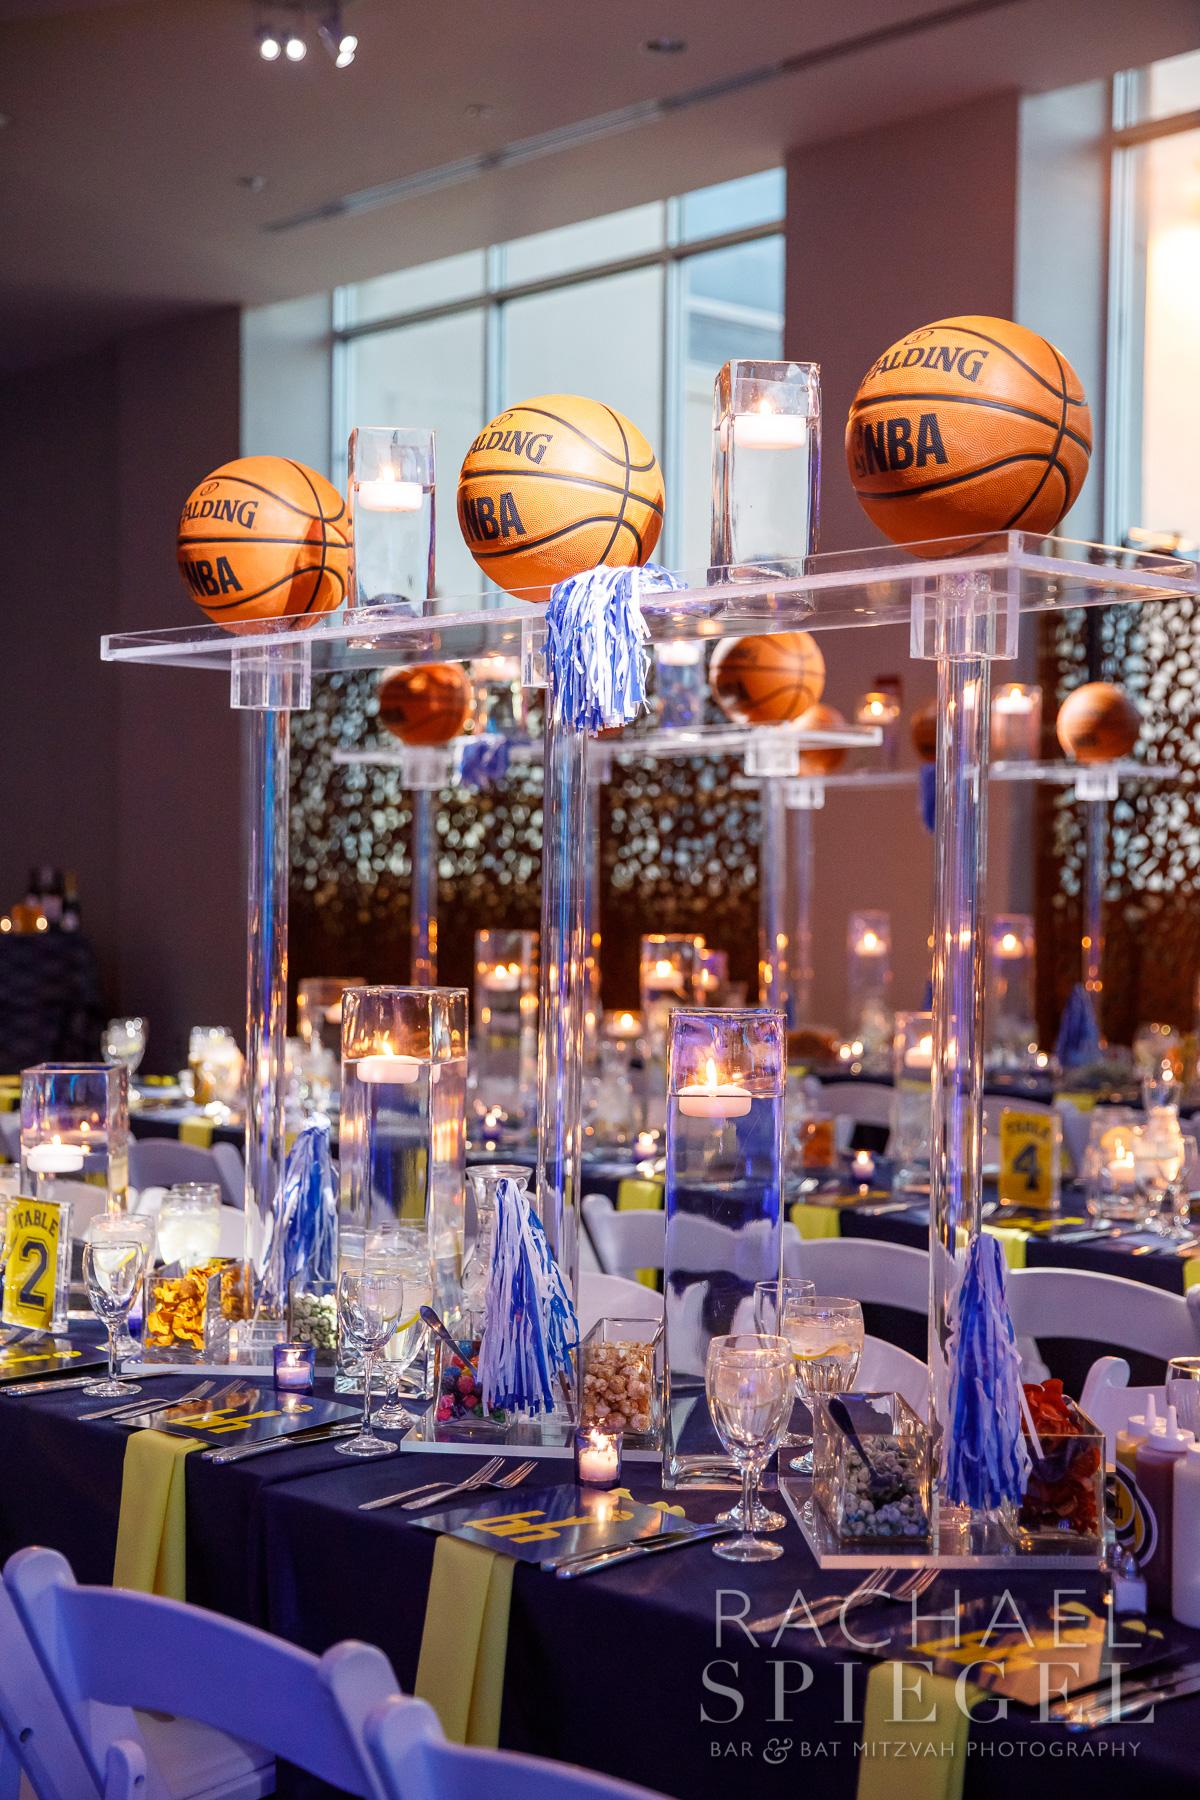 Basketball Bar Mitvah